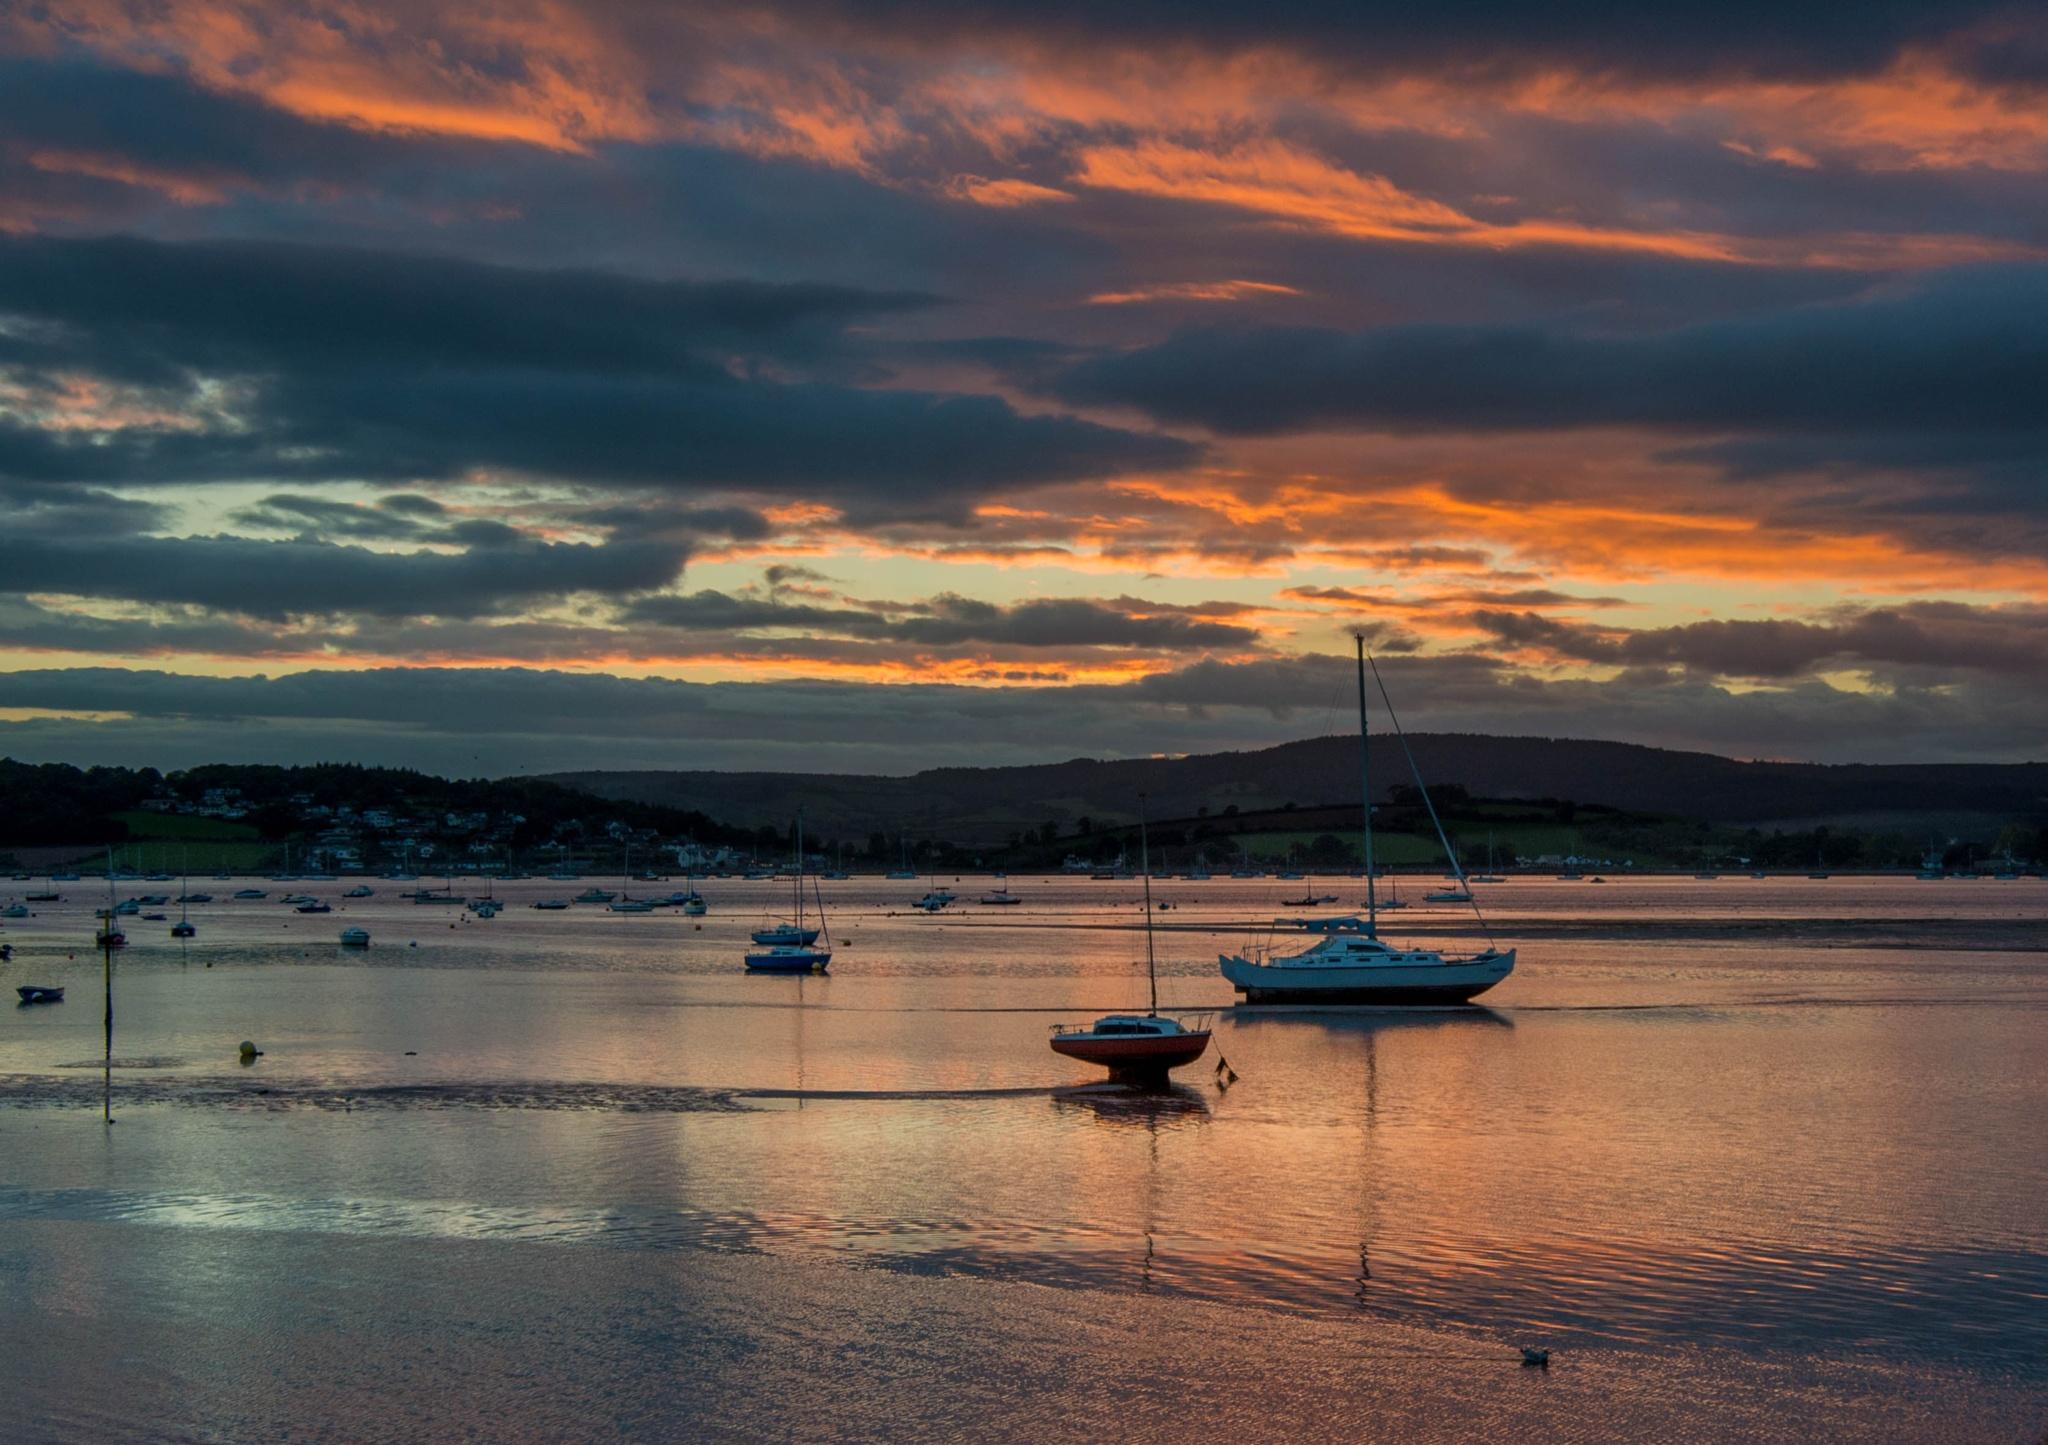 sunset exe estuary by Hammond Photography